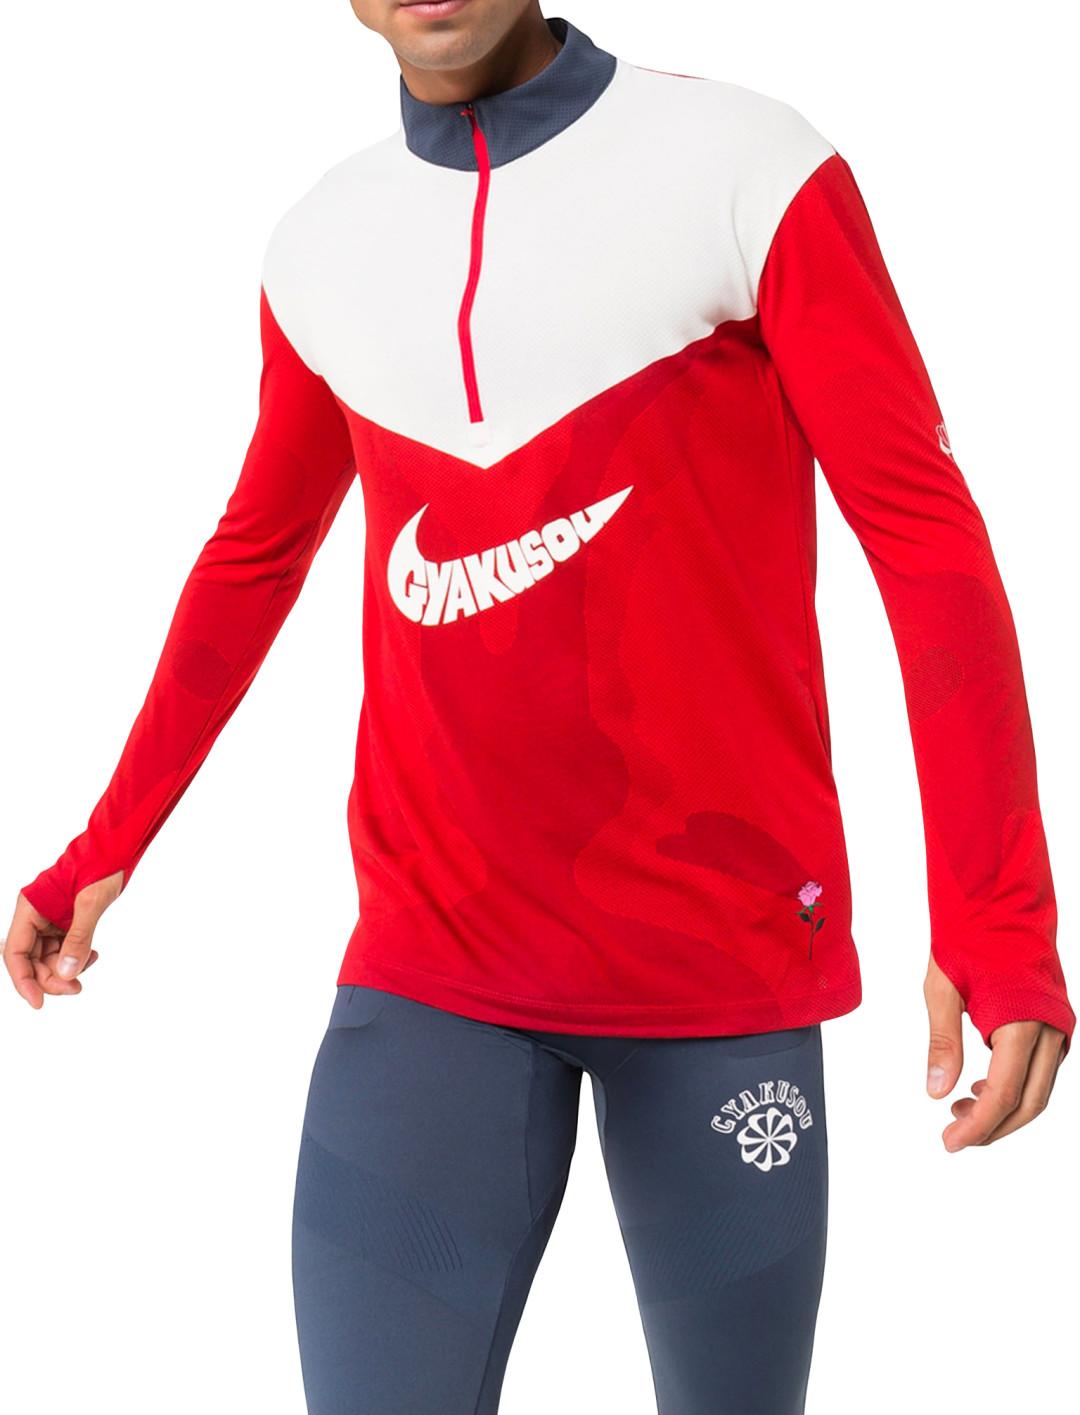 "Zipped Sports Top {""id"":5,""product_section_id"":1,""name"":""Clothing"",""order"":5} Nike x Gyakusou"